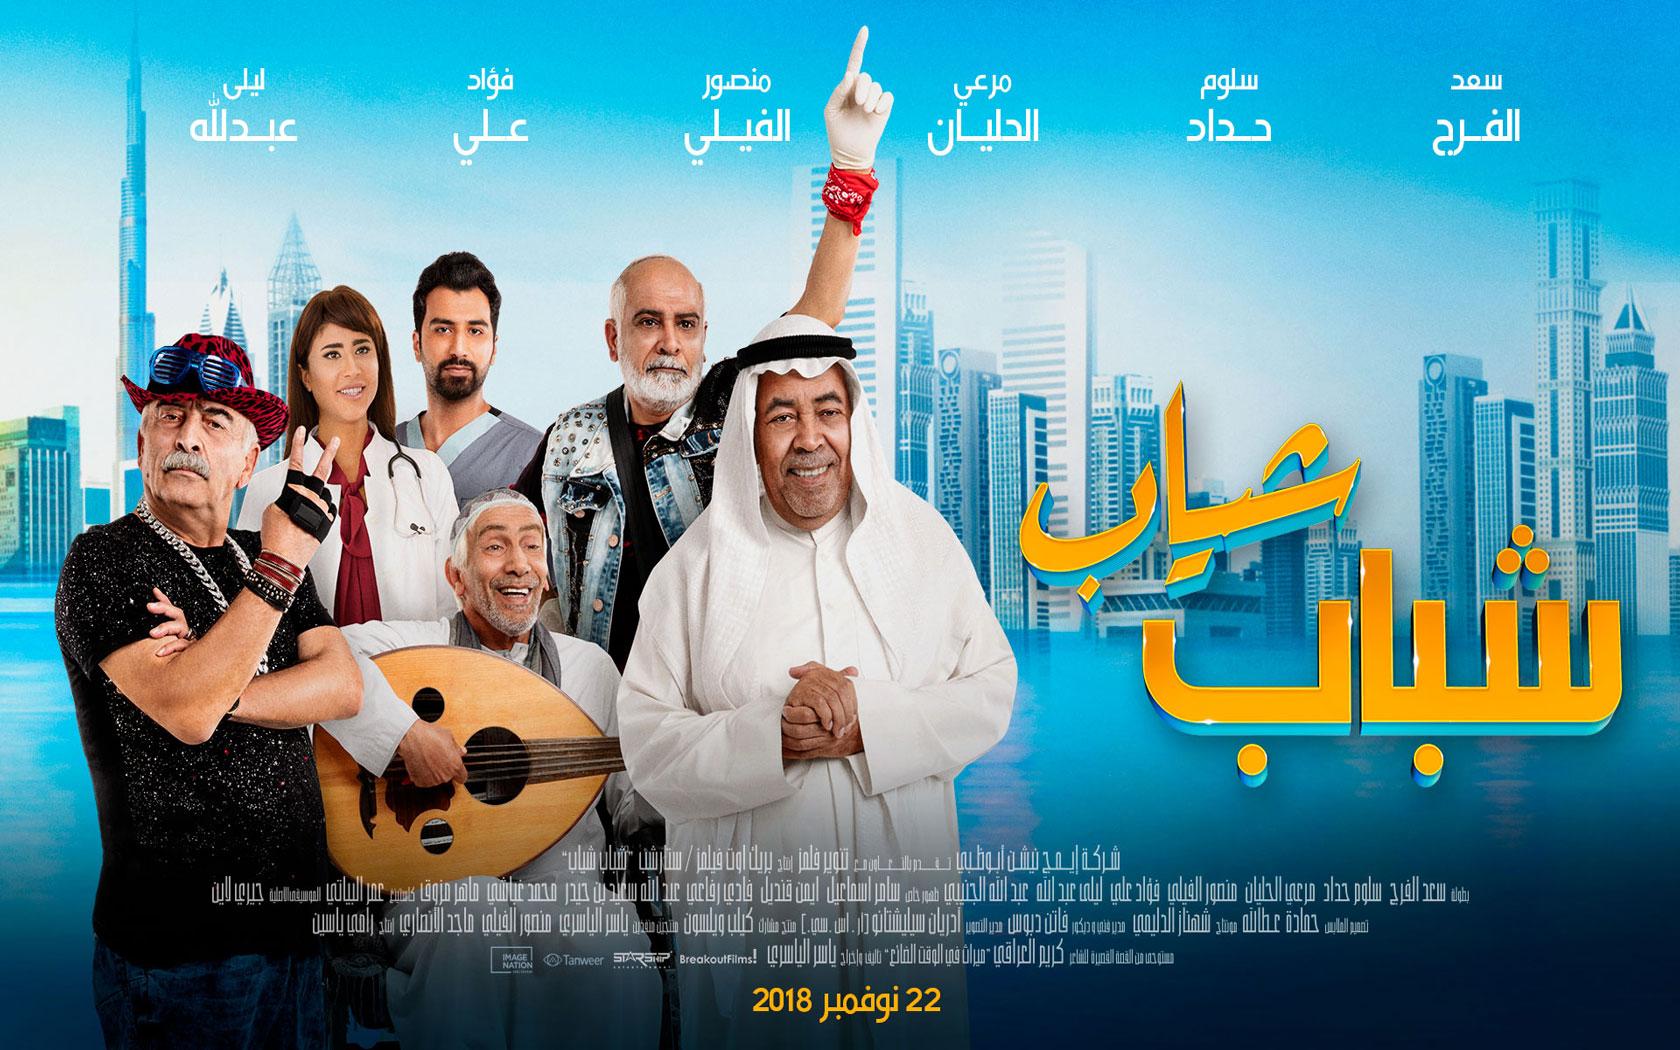 [فيلم][تورنت][تحميل][شباب شياب][2018][1080p][Web-DL][اماراتي] 2 arabp2p.com